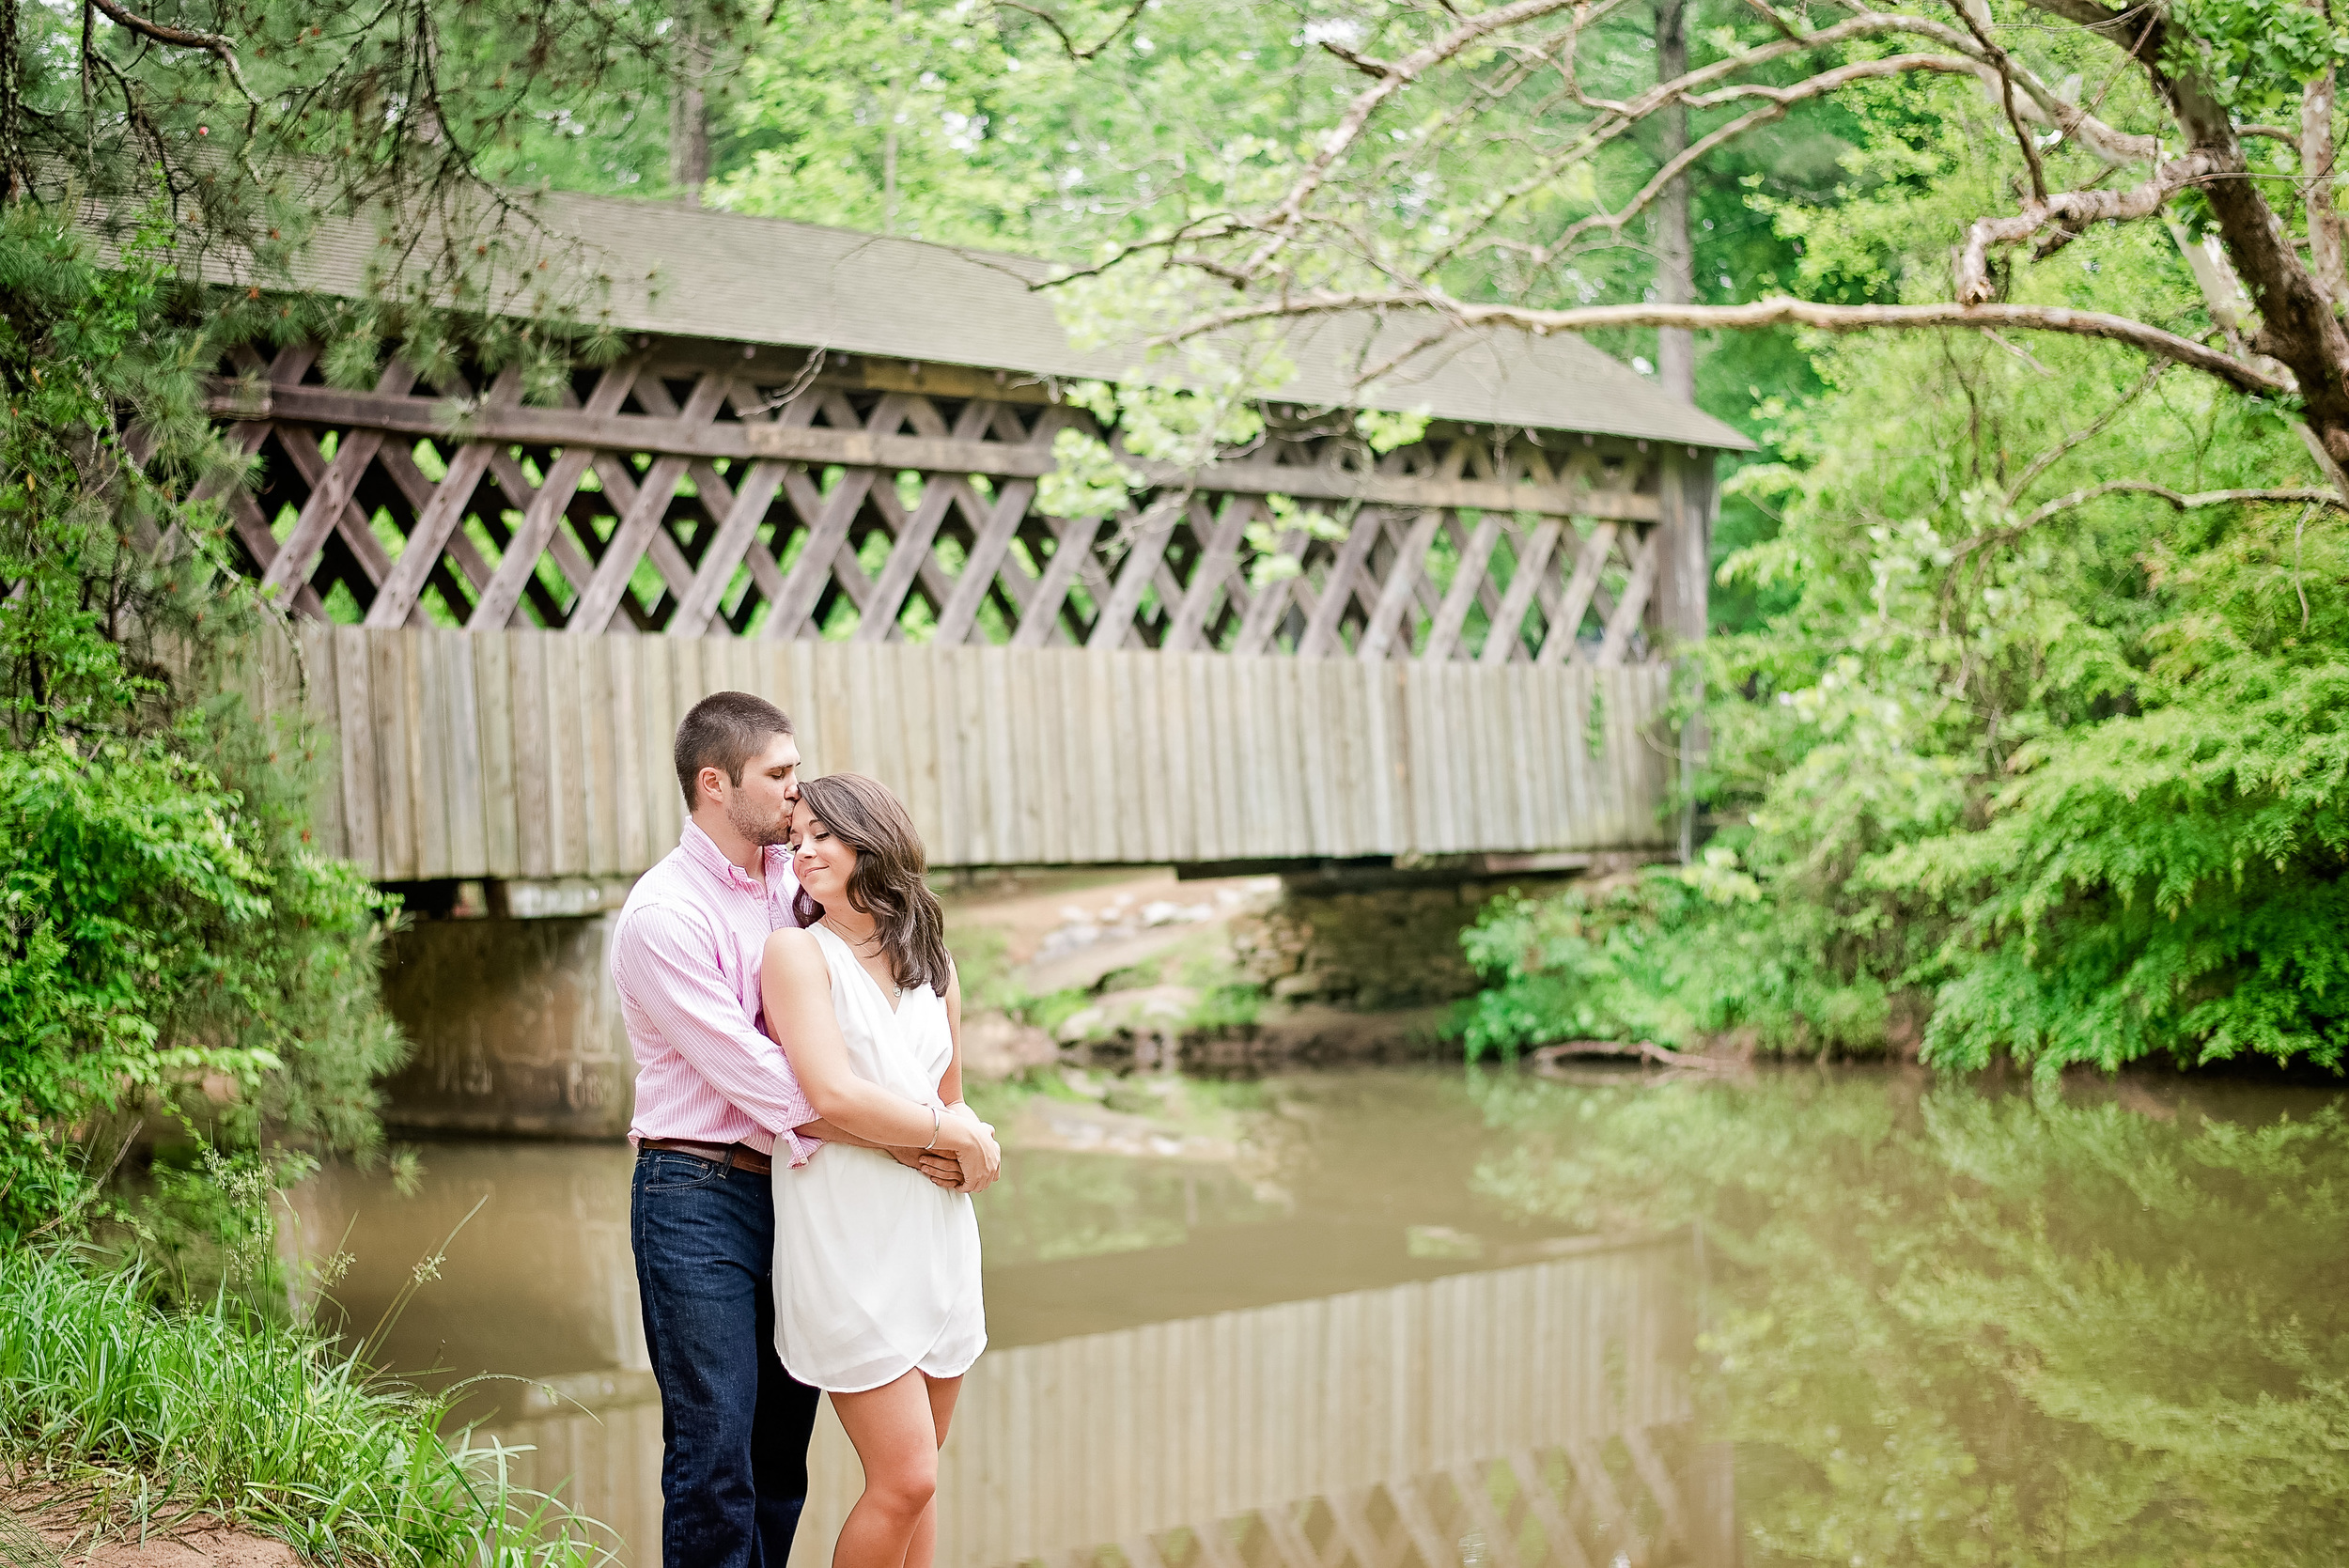 Engagement photos on a bridge